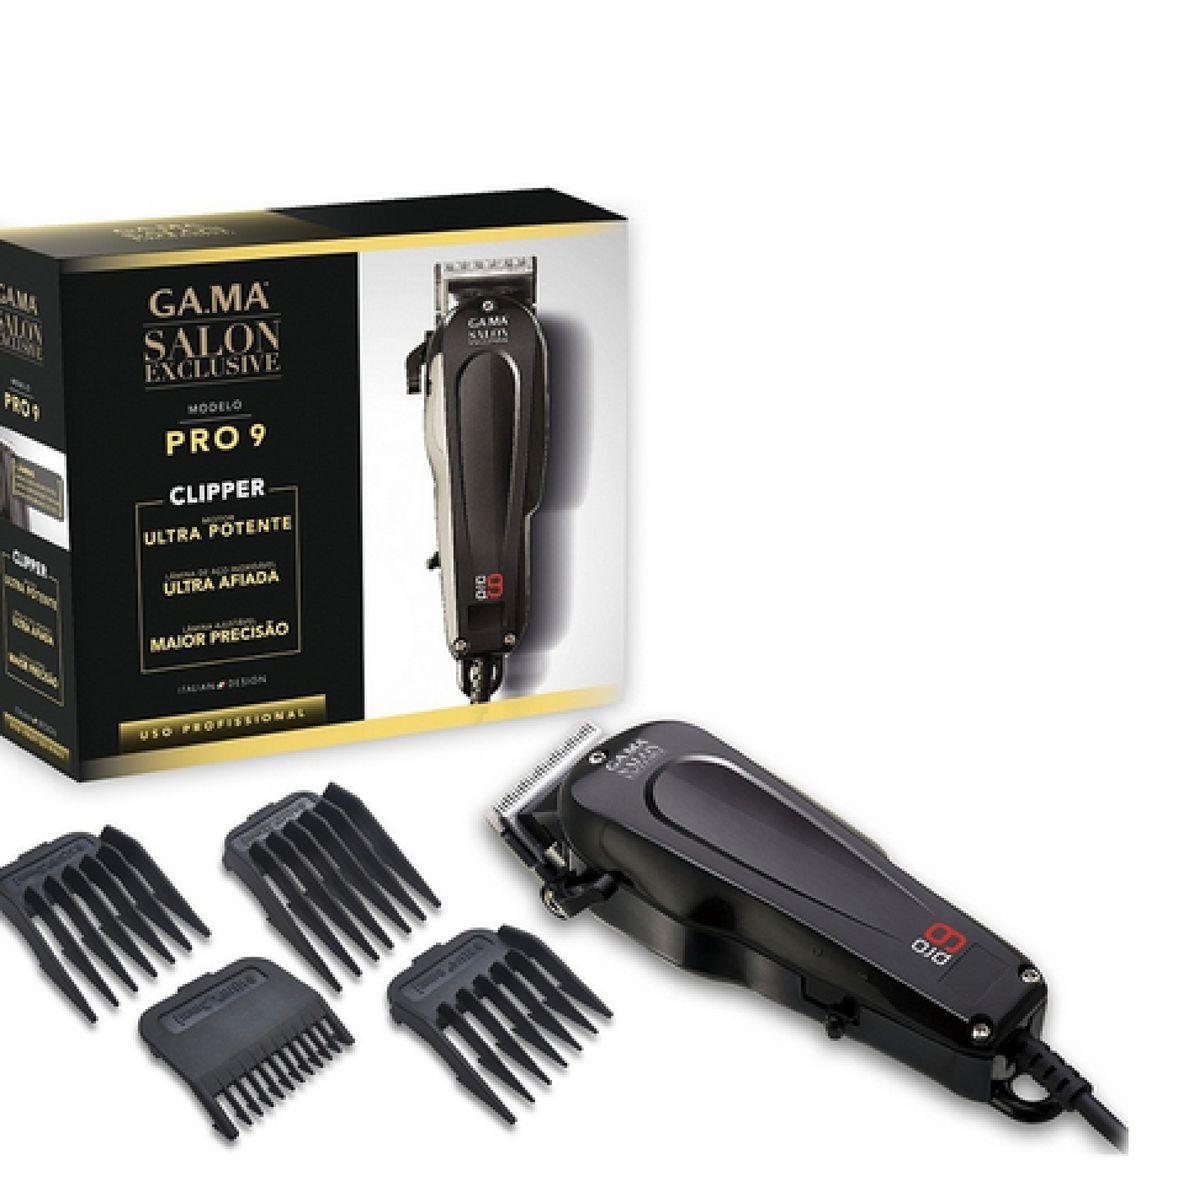 Maquina De Cortar cabelo para barbearia Gama Pro 9 220V - Gama italy R   295 e04b6c972cf1